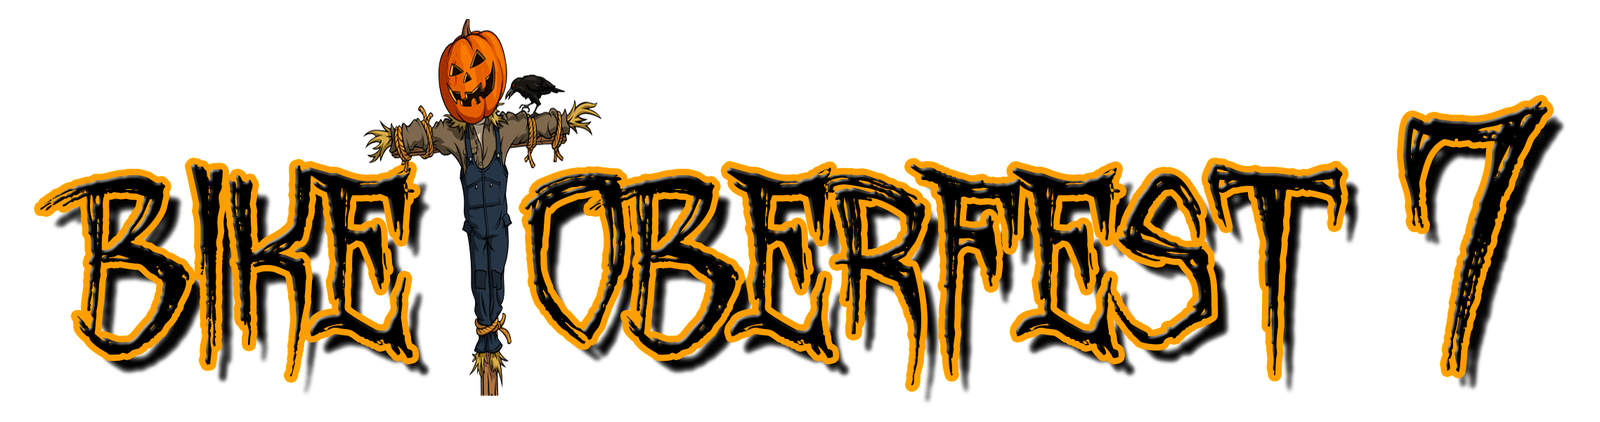 http://uploads.bmxmuseum.com/user-images/142962/biketoberfest-logo-257bcc8fc60.jpg